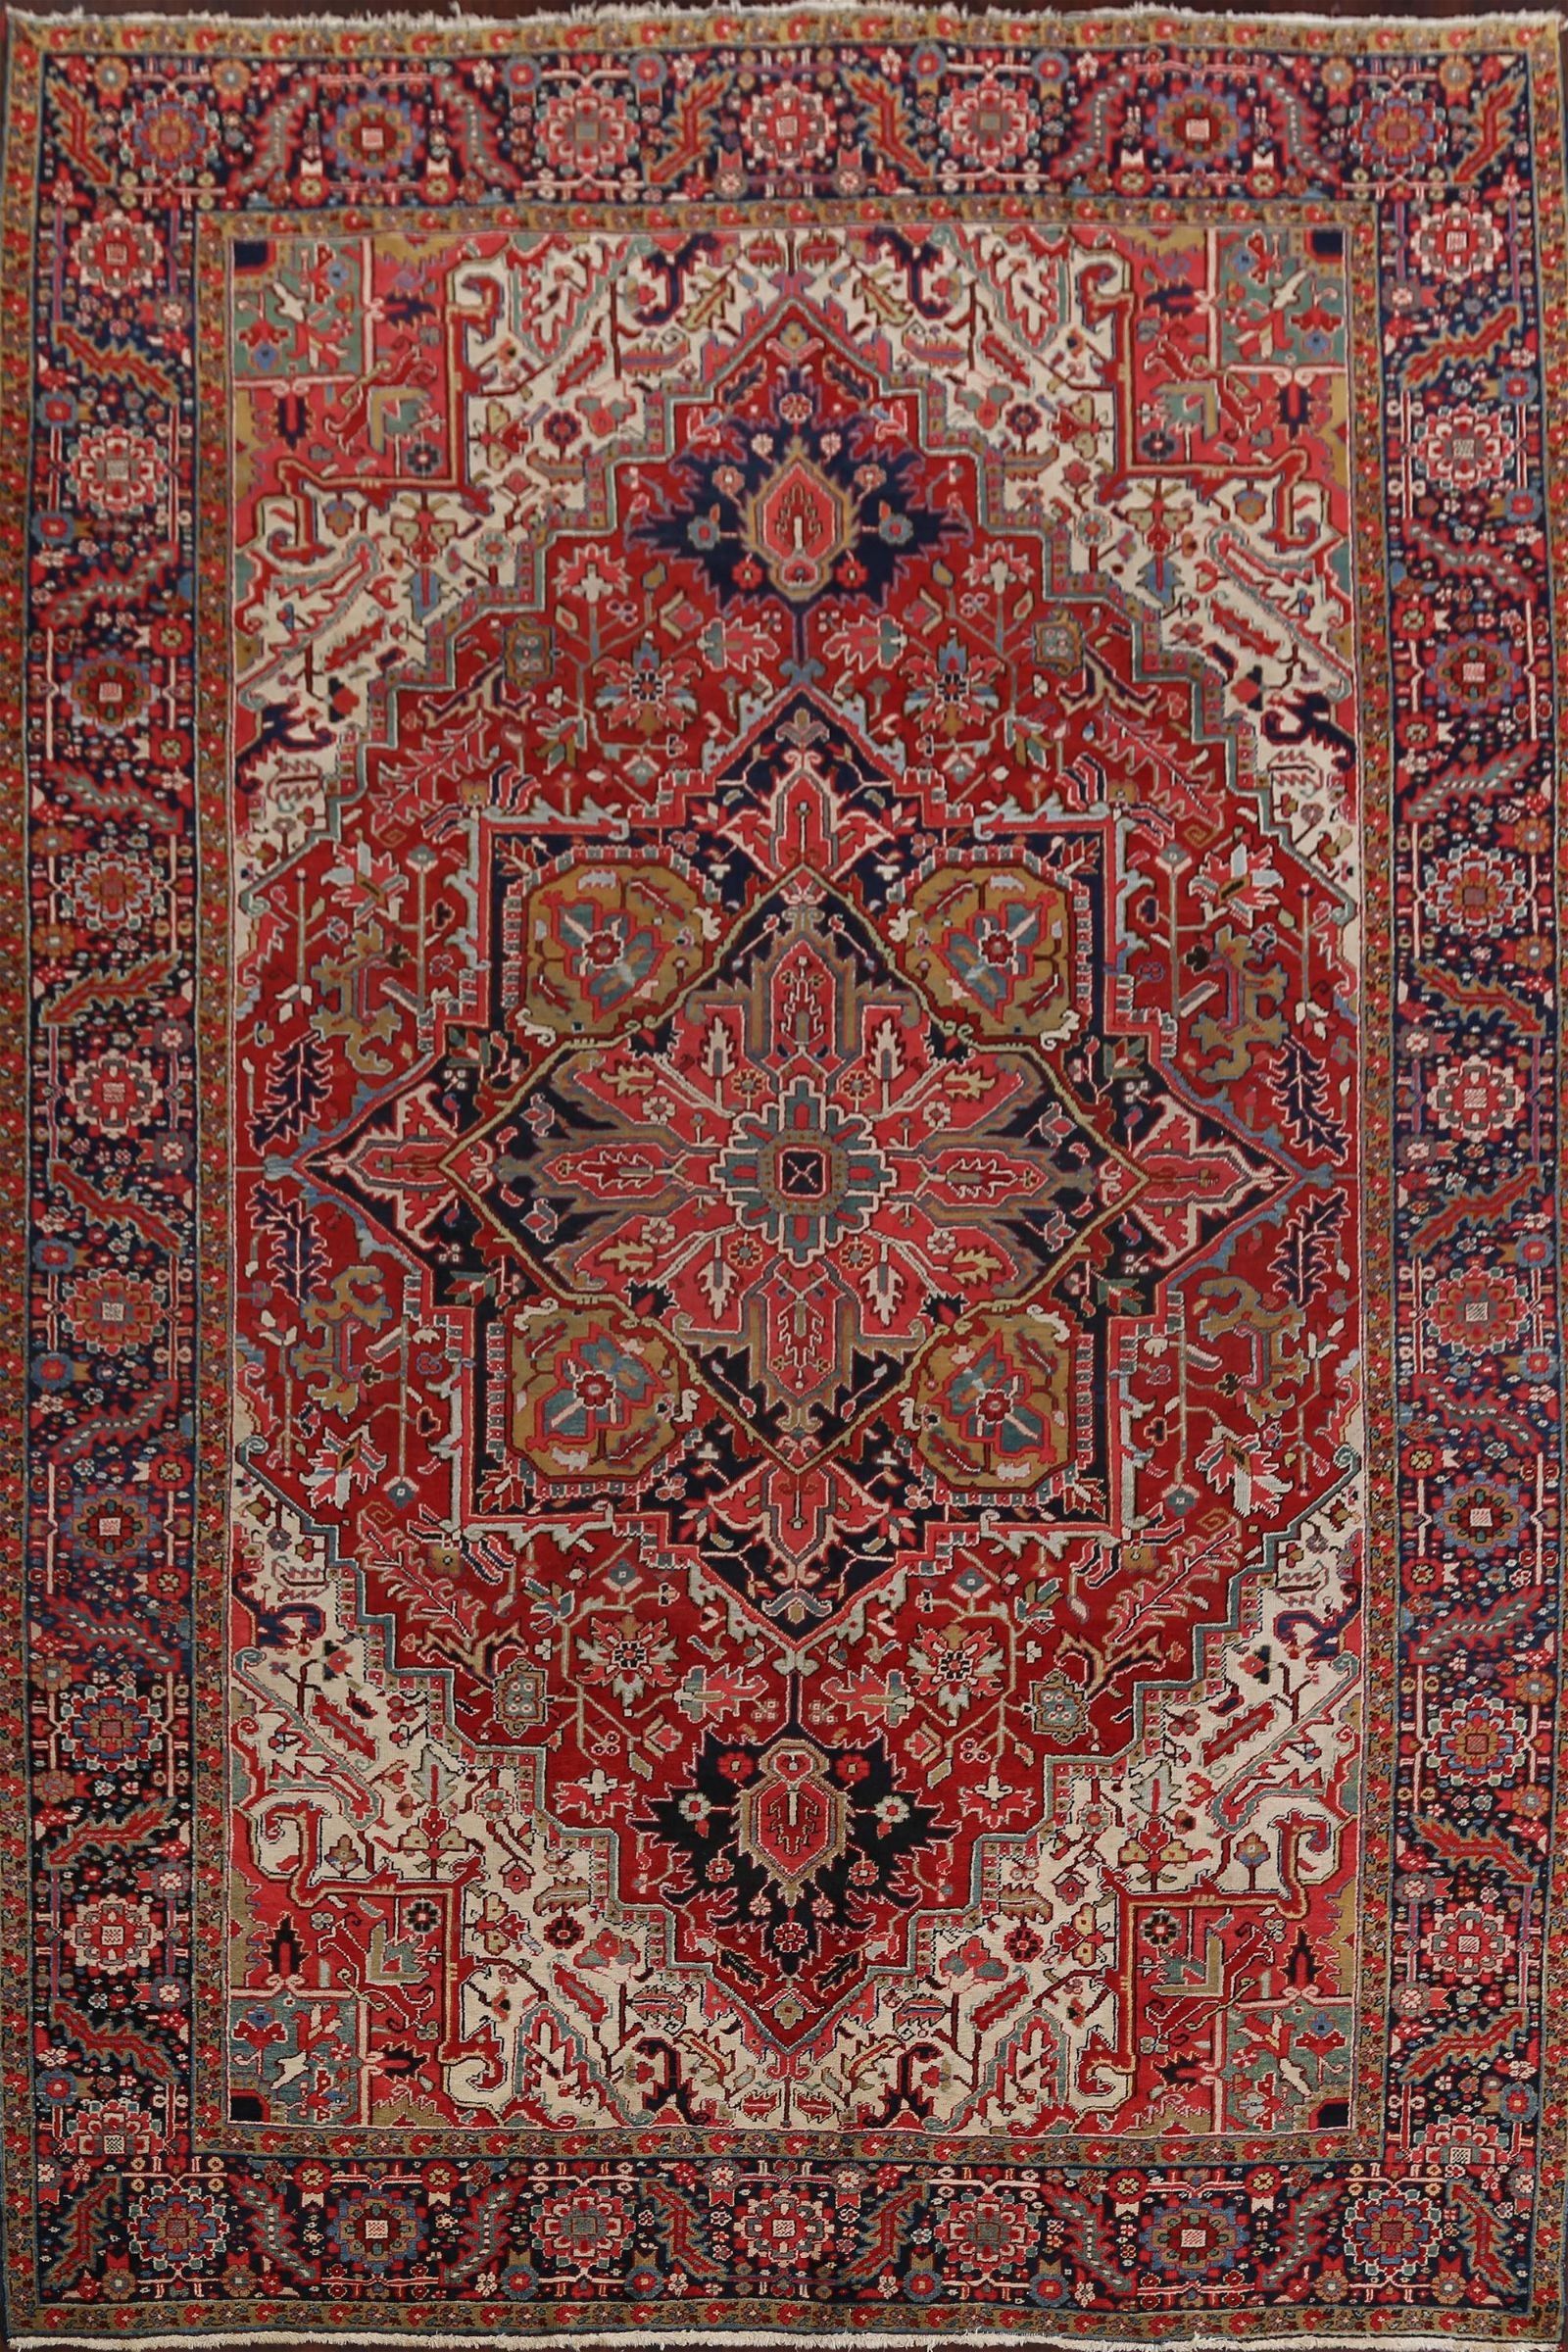 Antique Vegetable Dye Heriz Serapi Persian Area Rug